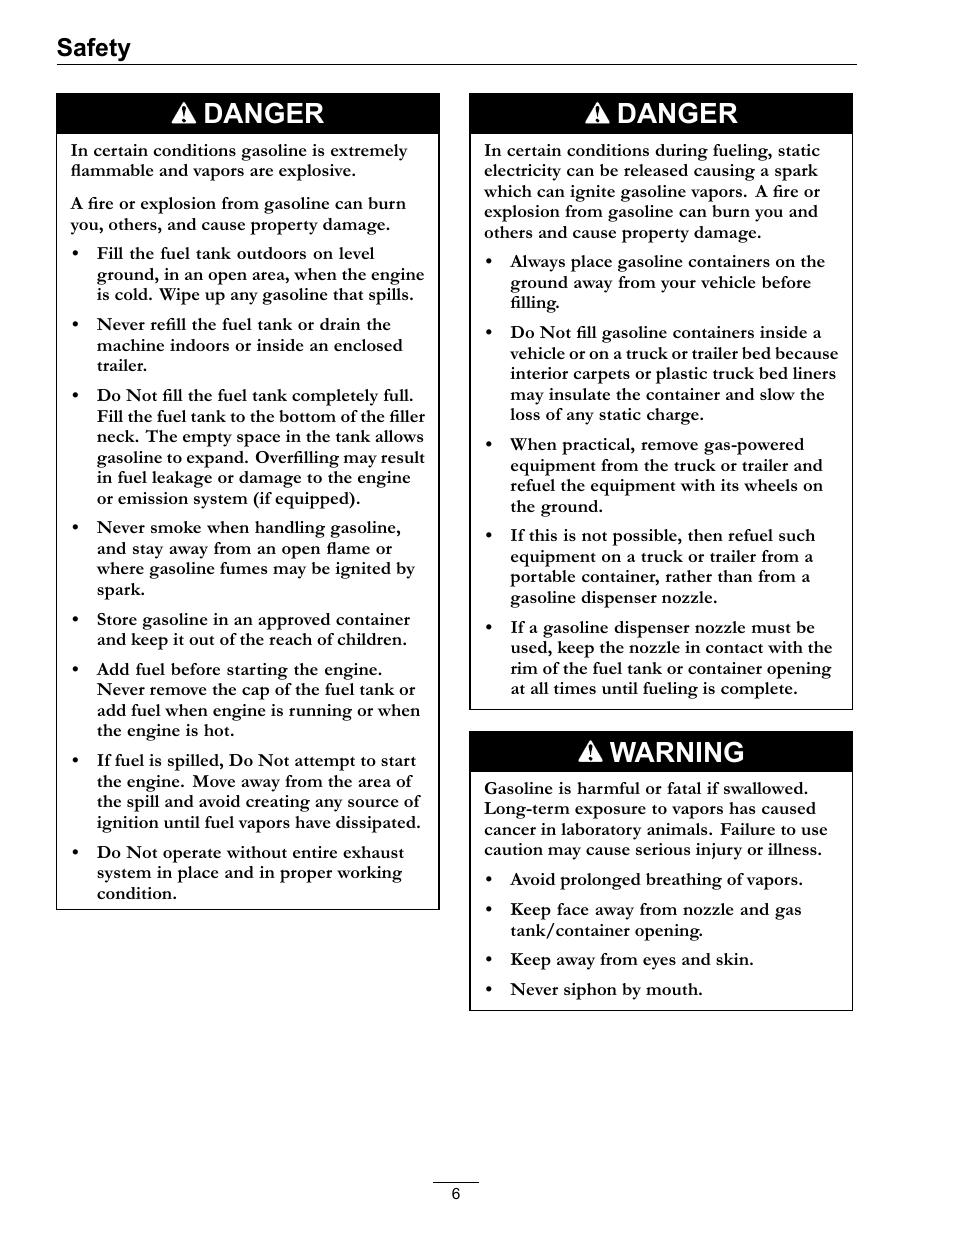 danger warning safety exmark navigator 0 user manual page 6 rh manualsdir com exmark navigator parts manual exmark navigator deck manual